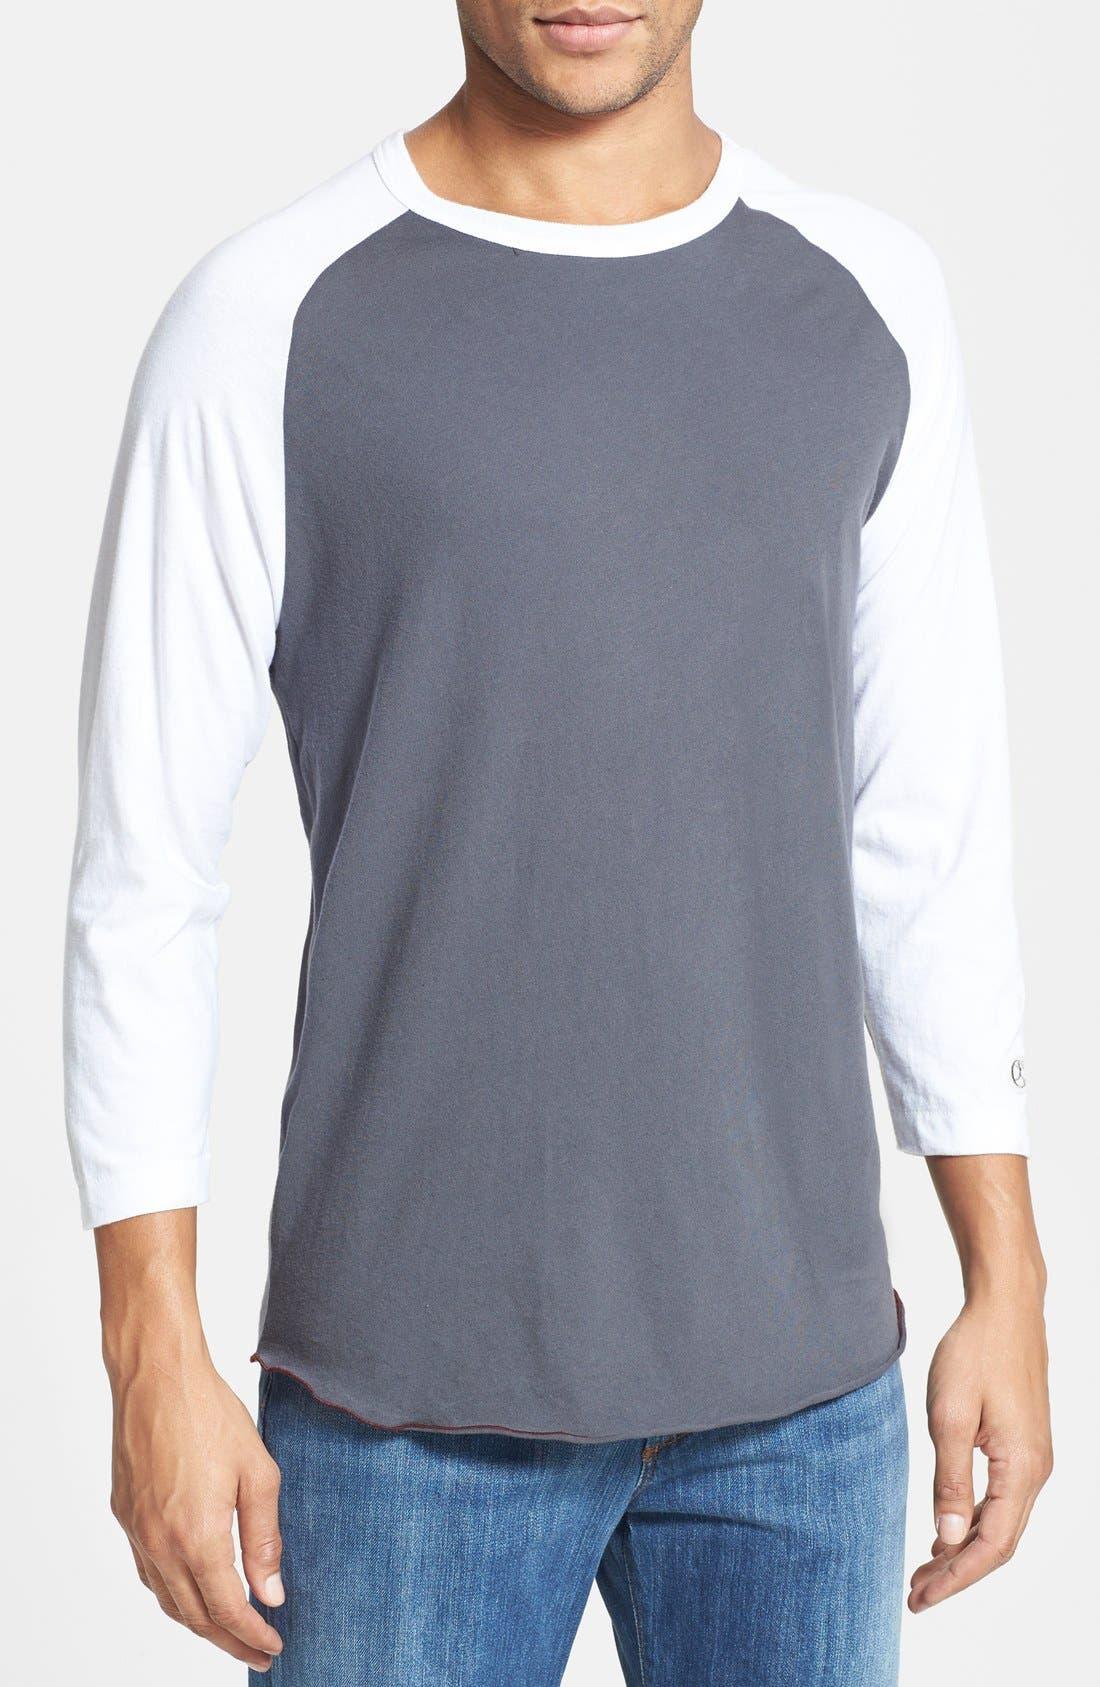 Alternate Image 1 Selected - Todd Snyder + Champion Baseball T-Shirt